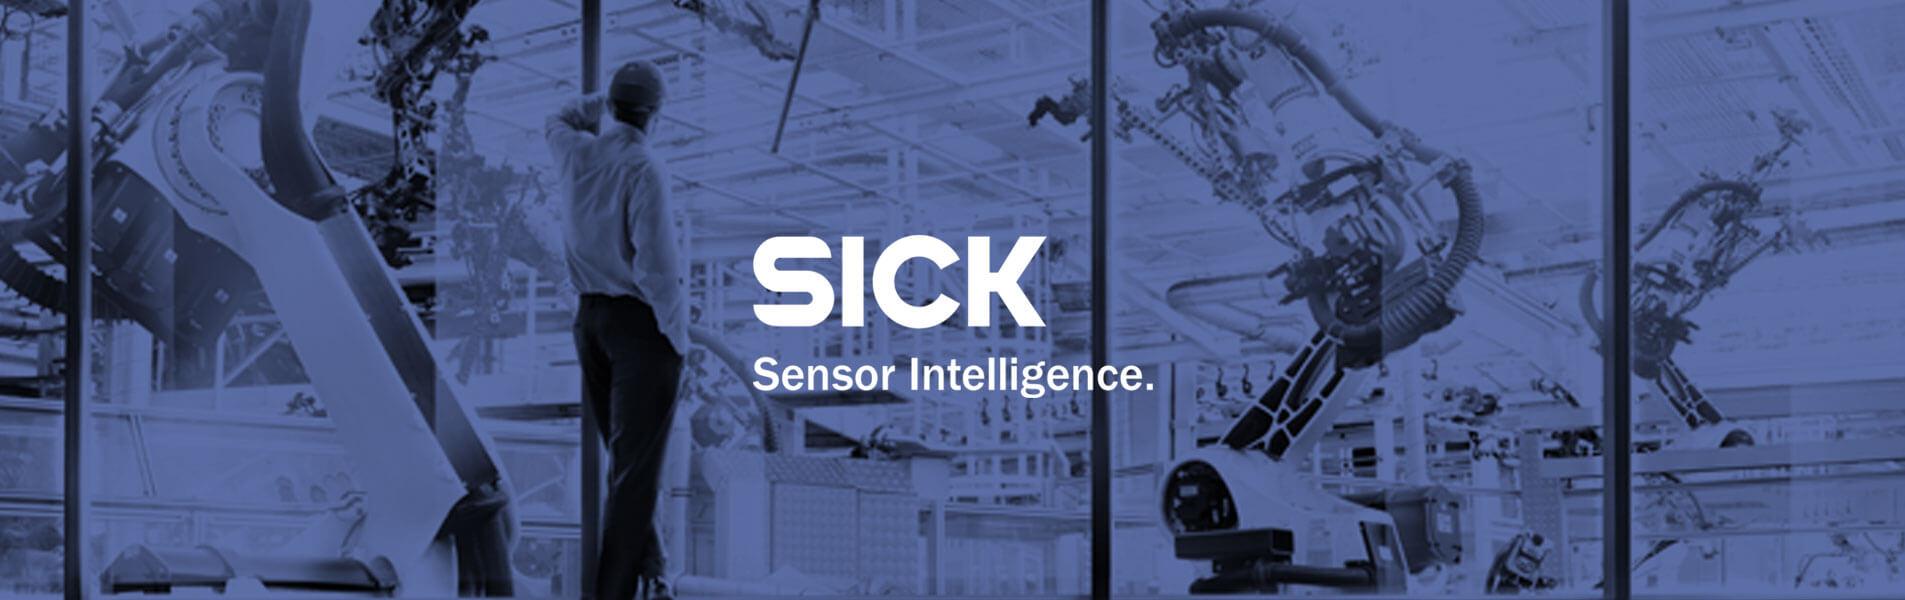 Sick training – Industry 4.0